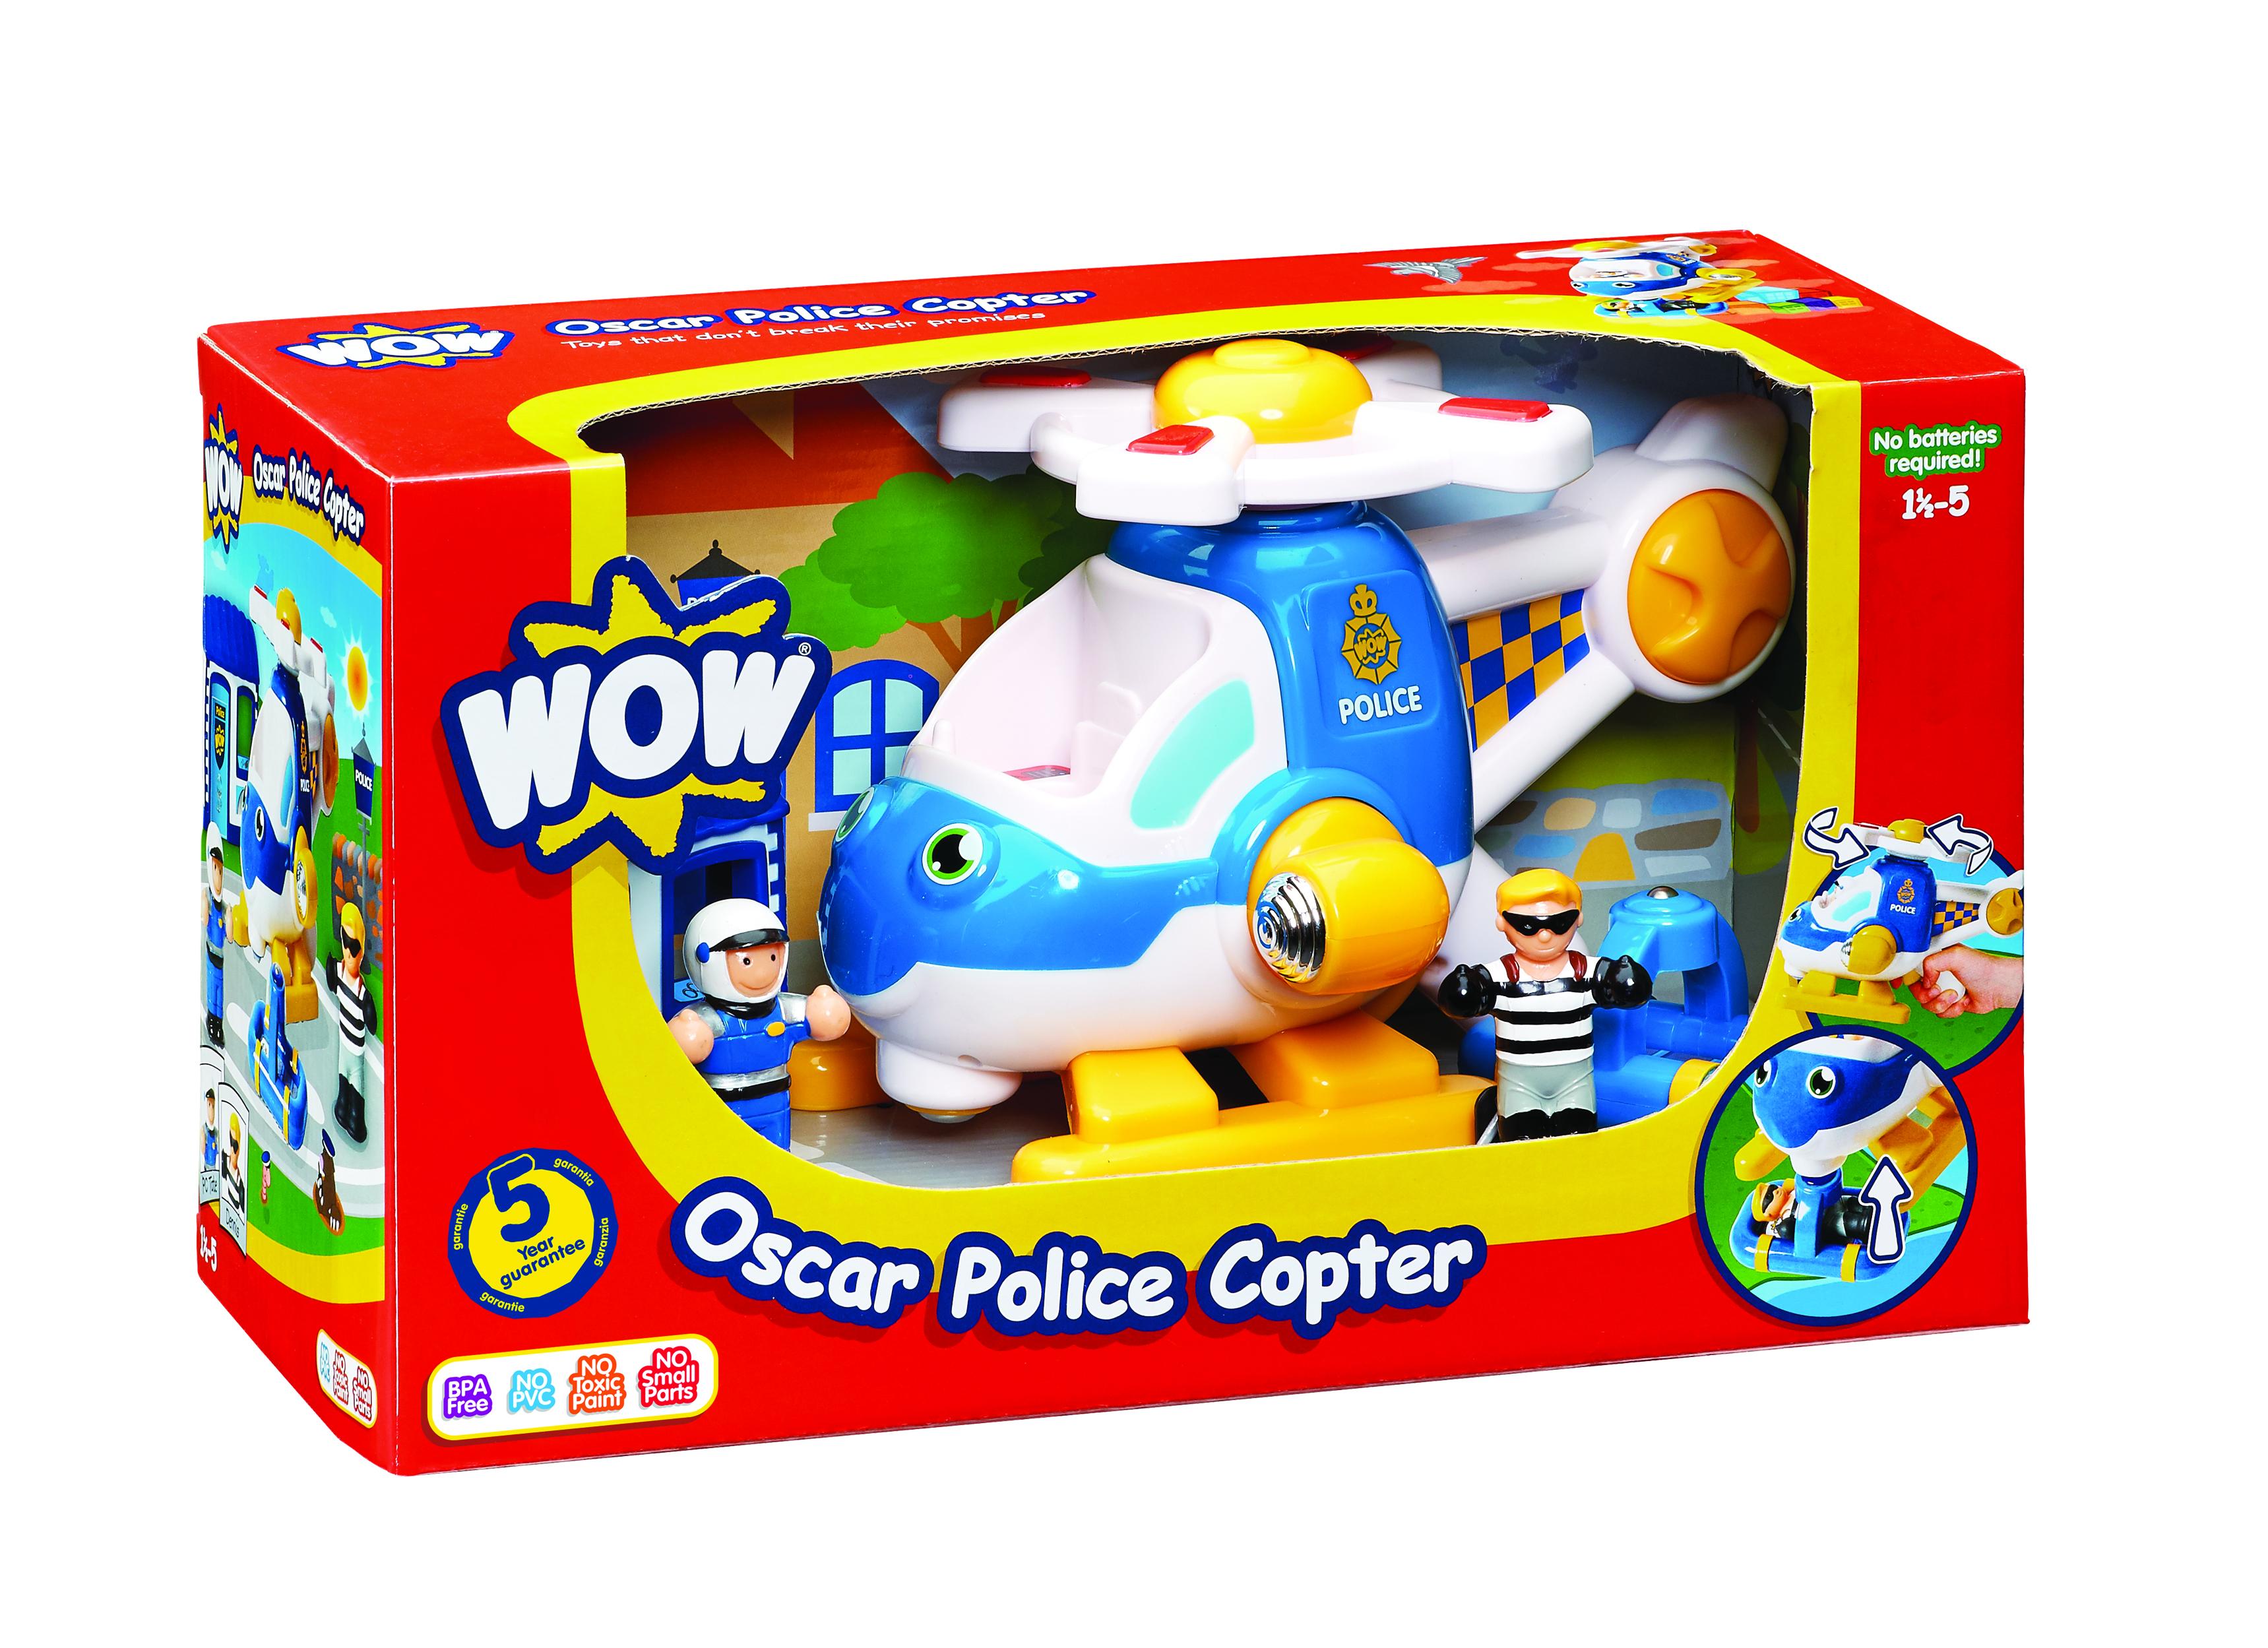 Oscar Police Copter | Polar PalacePolar Palace